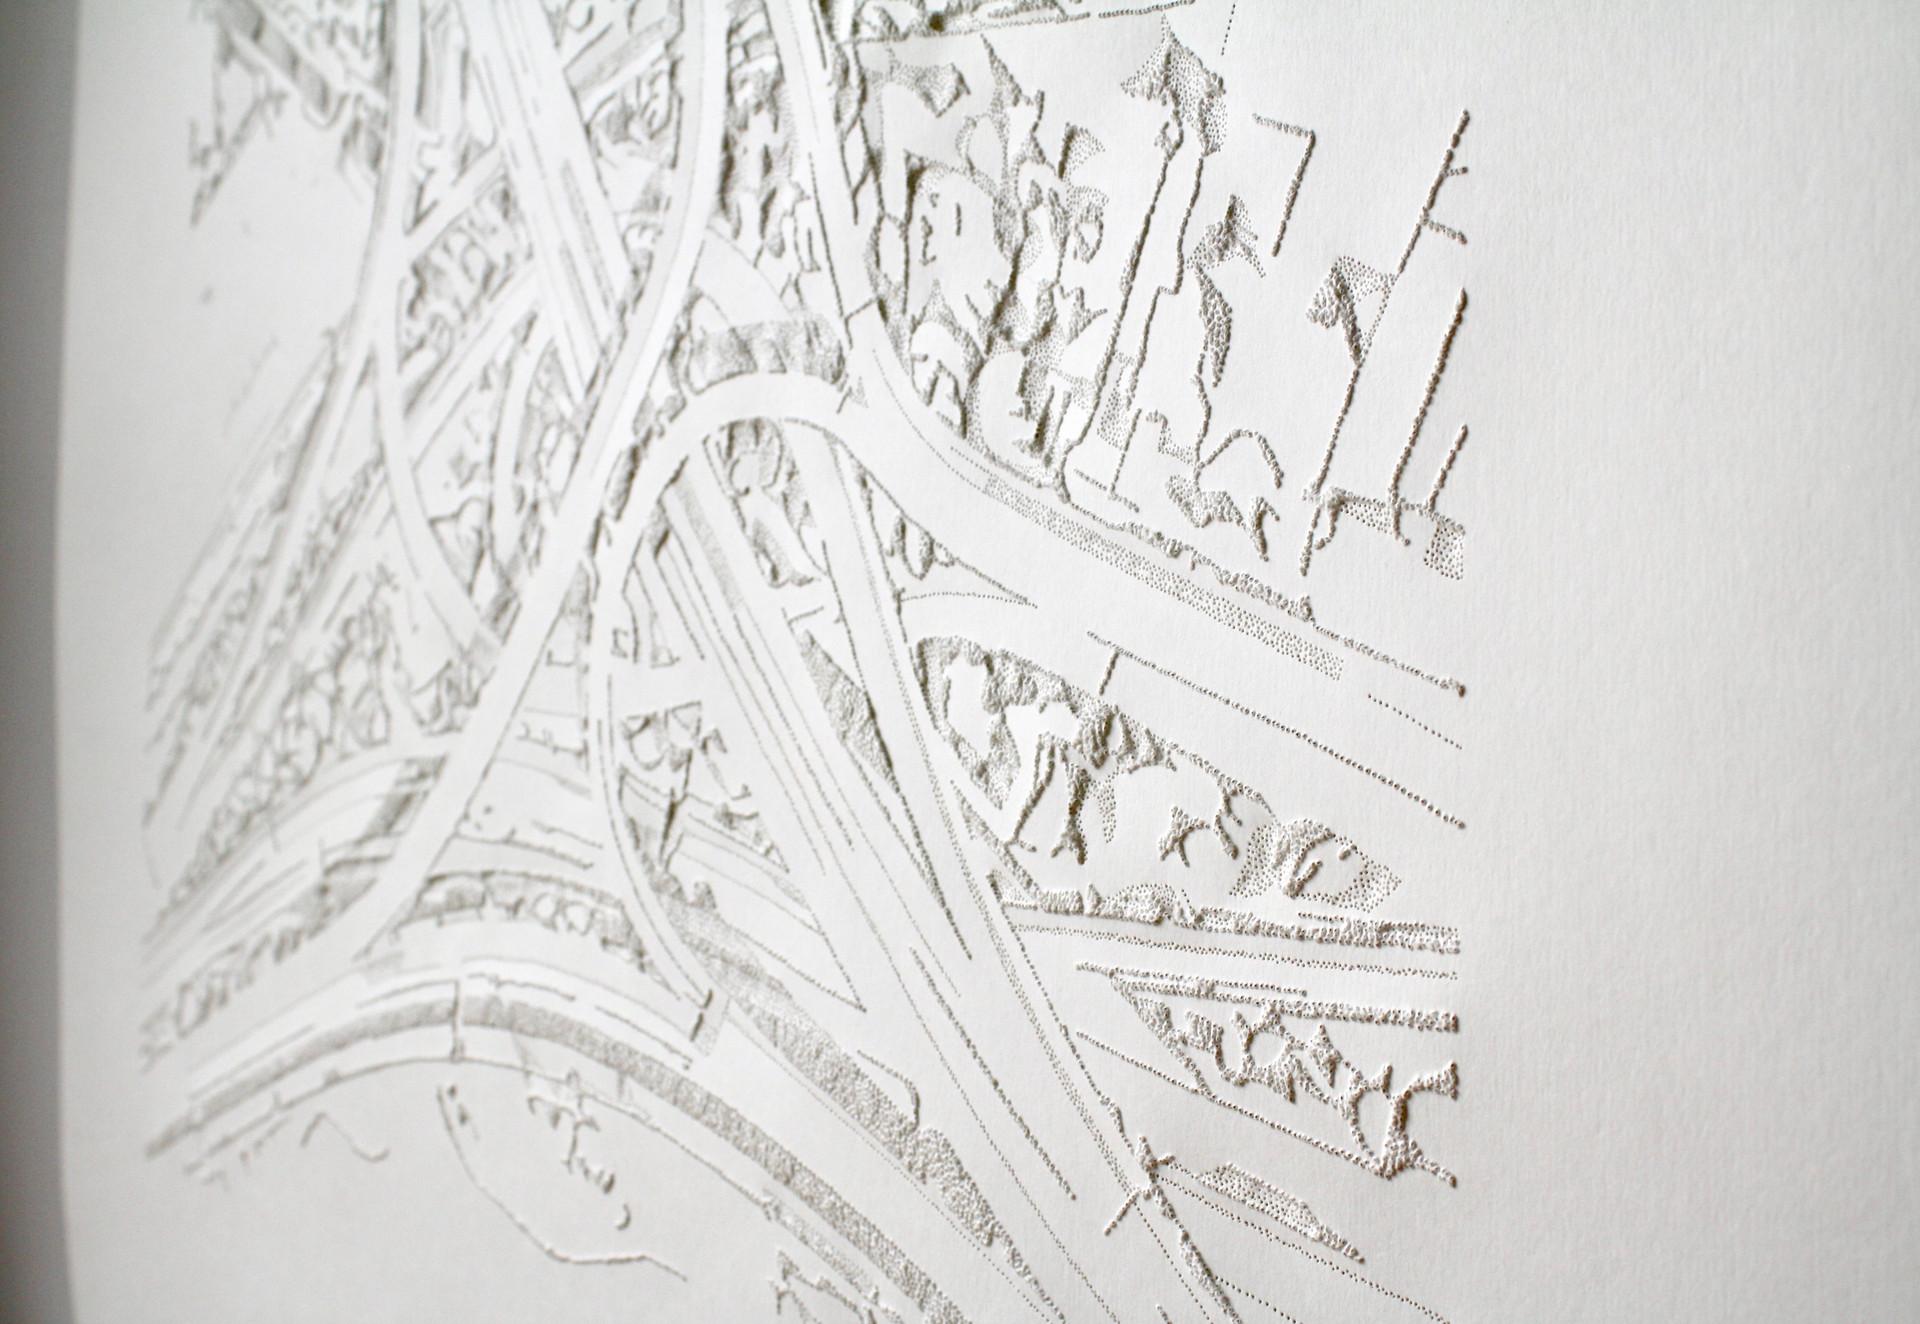 Spaghetti Junction, Birmingham III.jpg